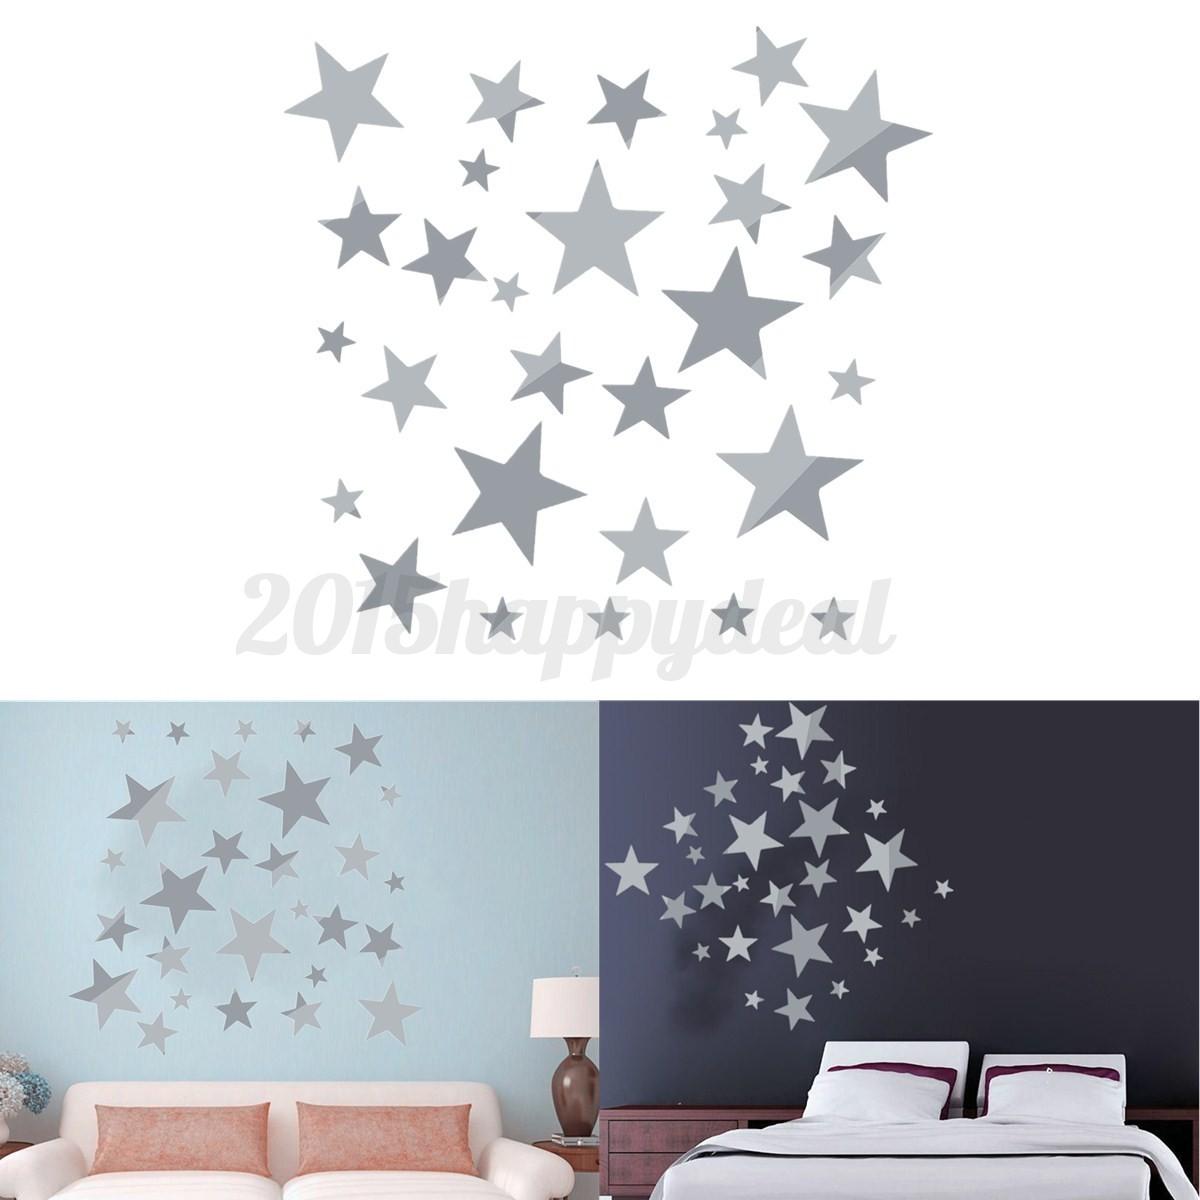 Star mirror wall decals